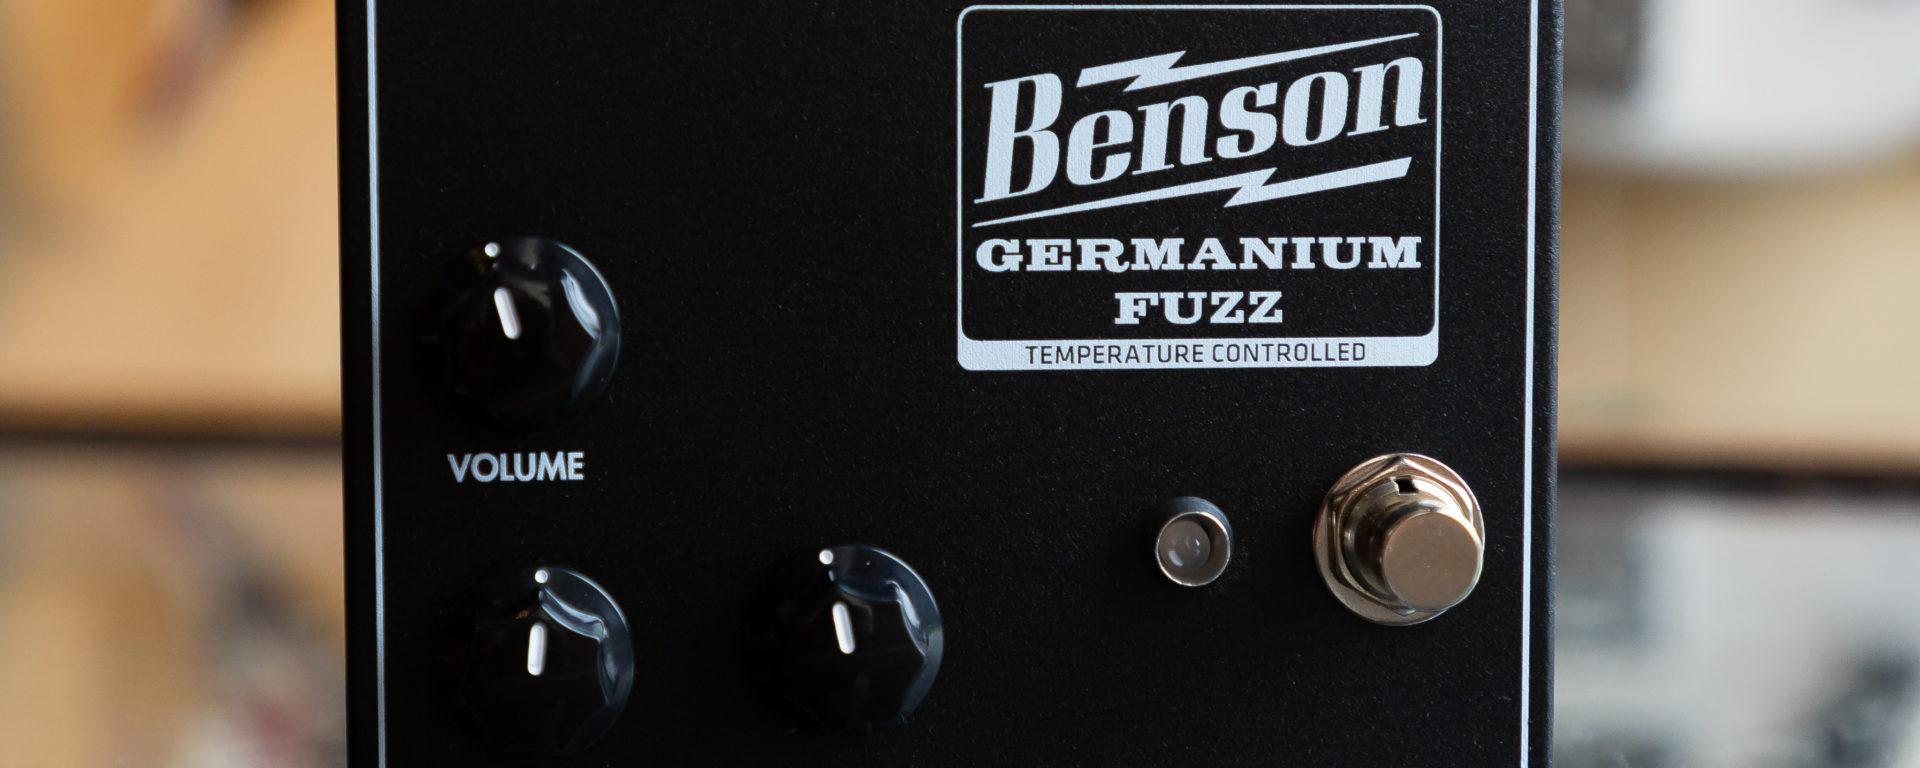 Benson Amps - Germanium Fuzz - Studio Black